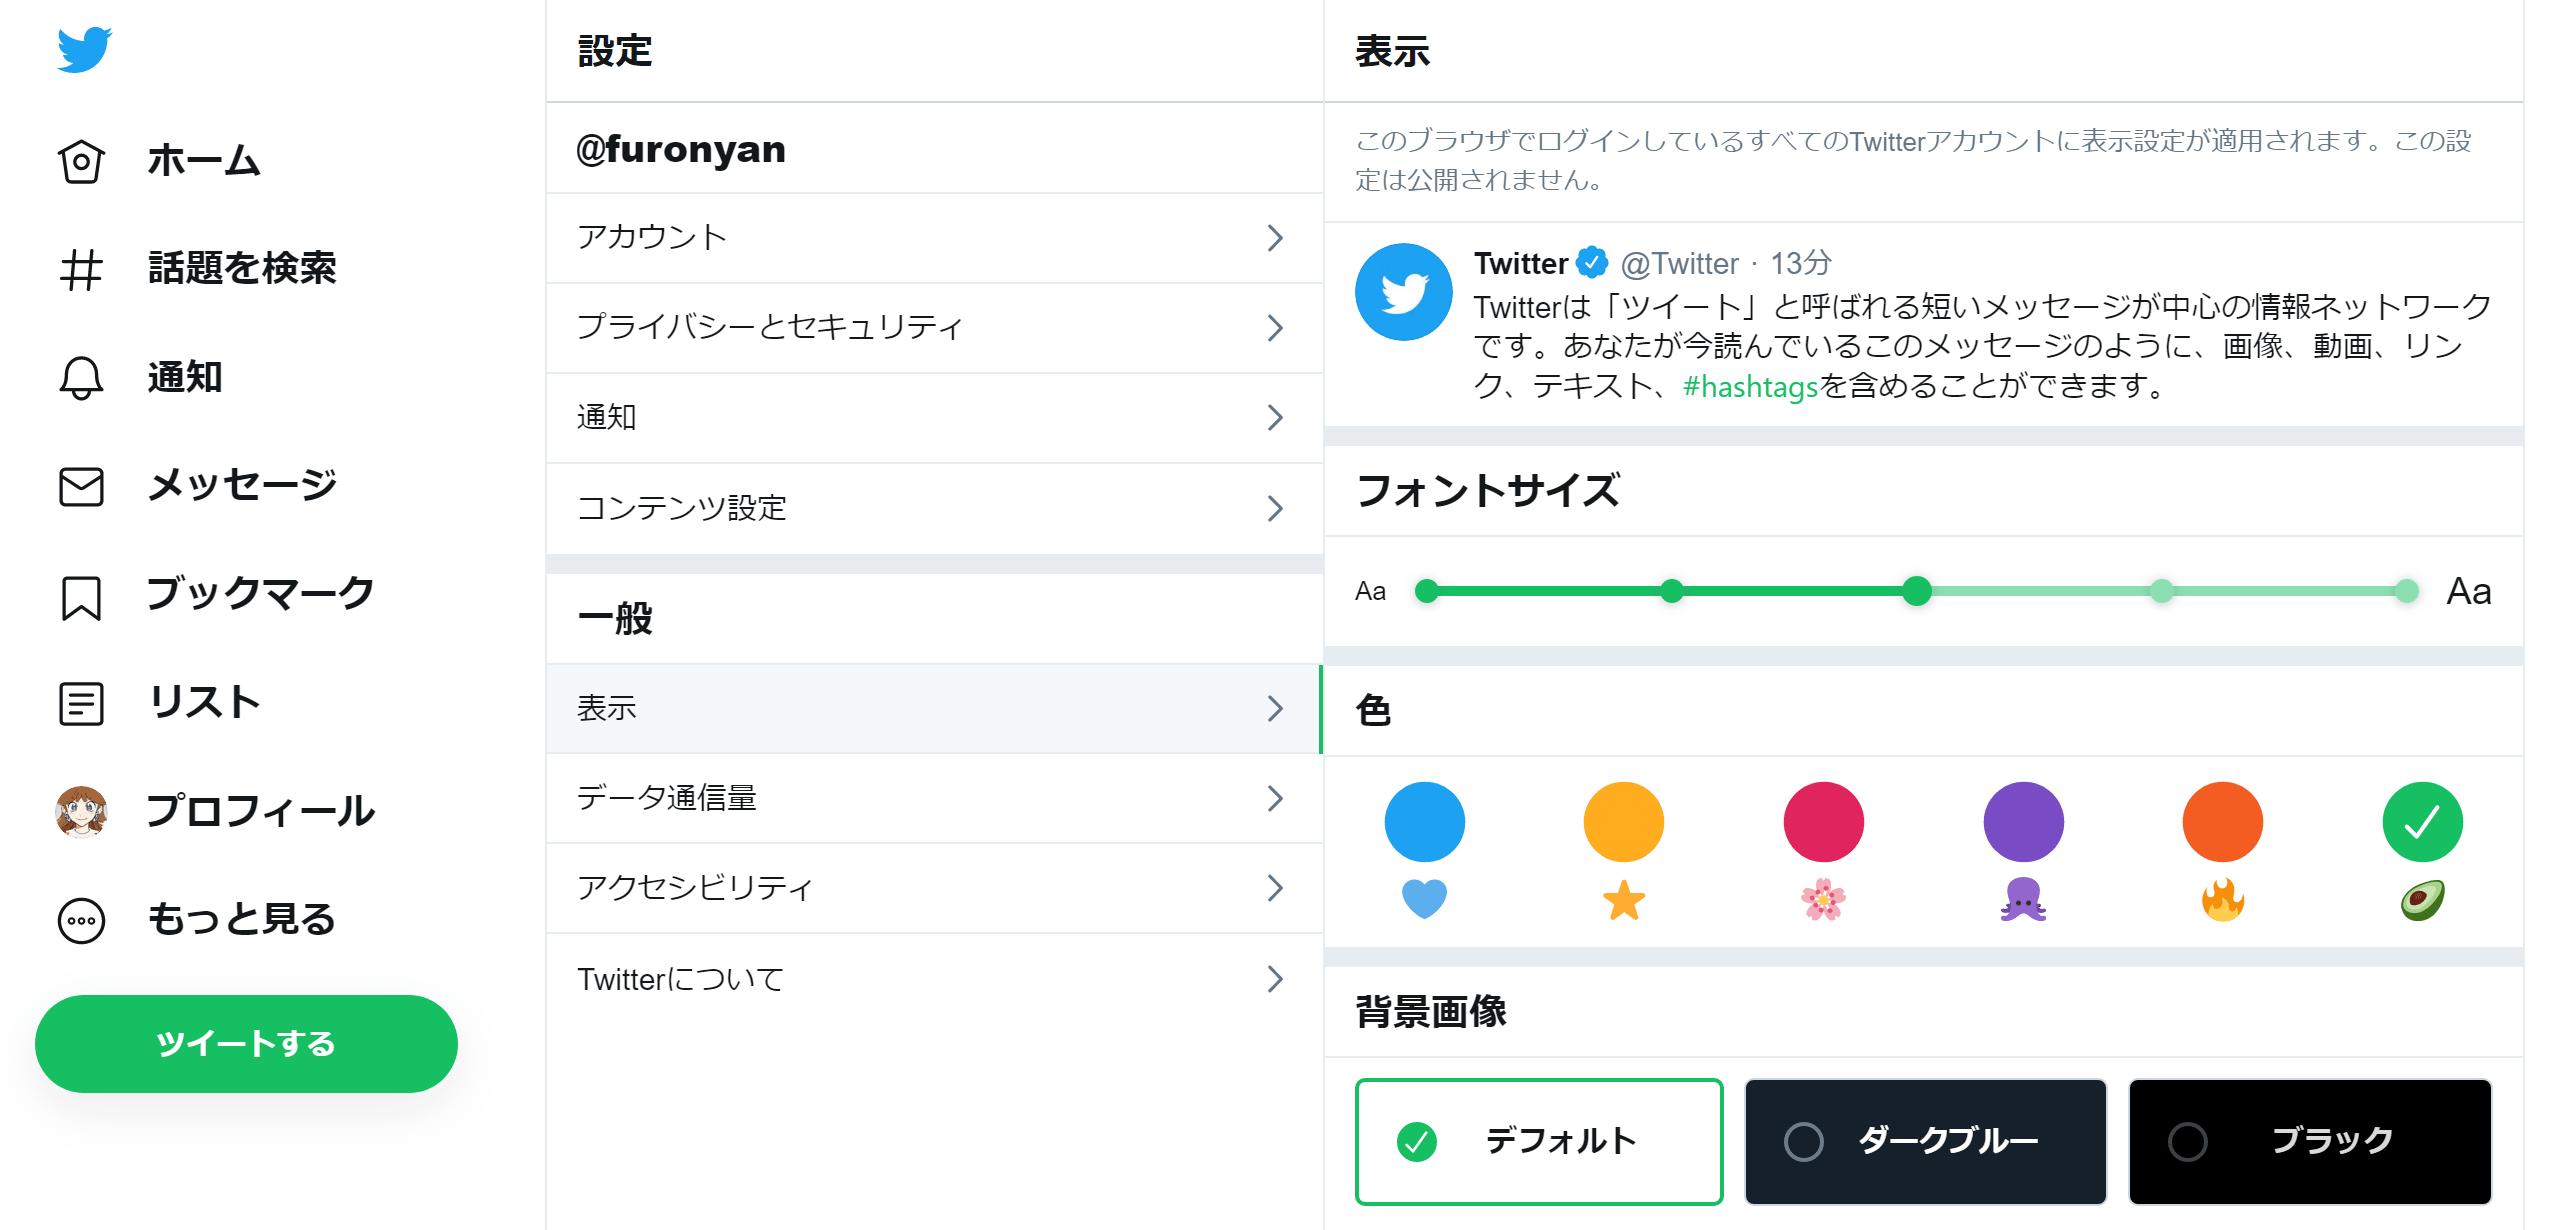 Twitterの背景色表示設定、デフォルトの白背景モード